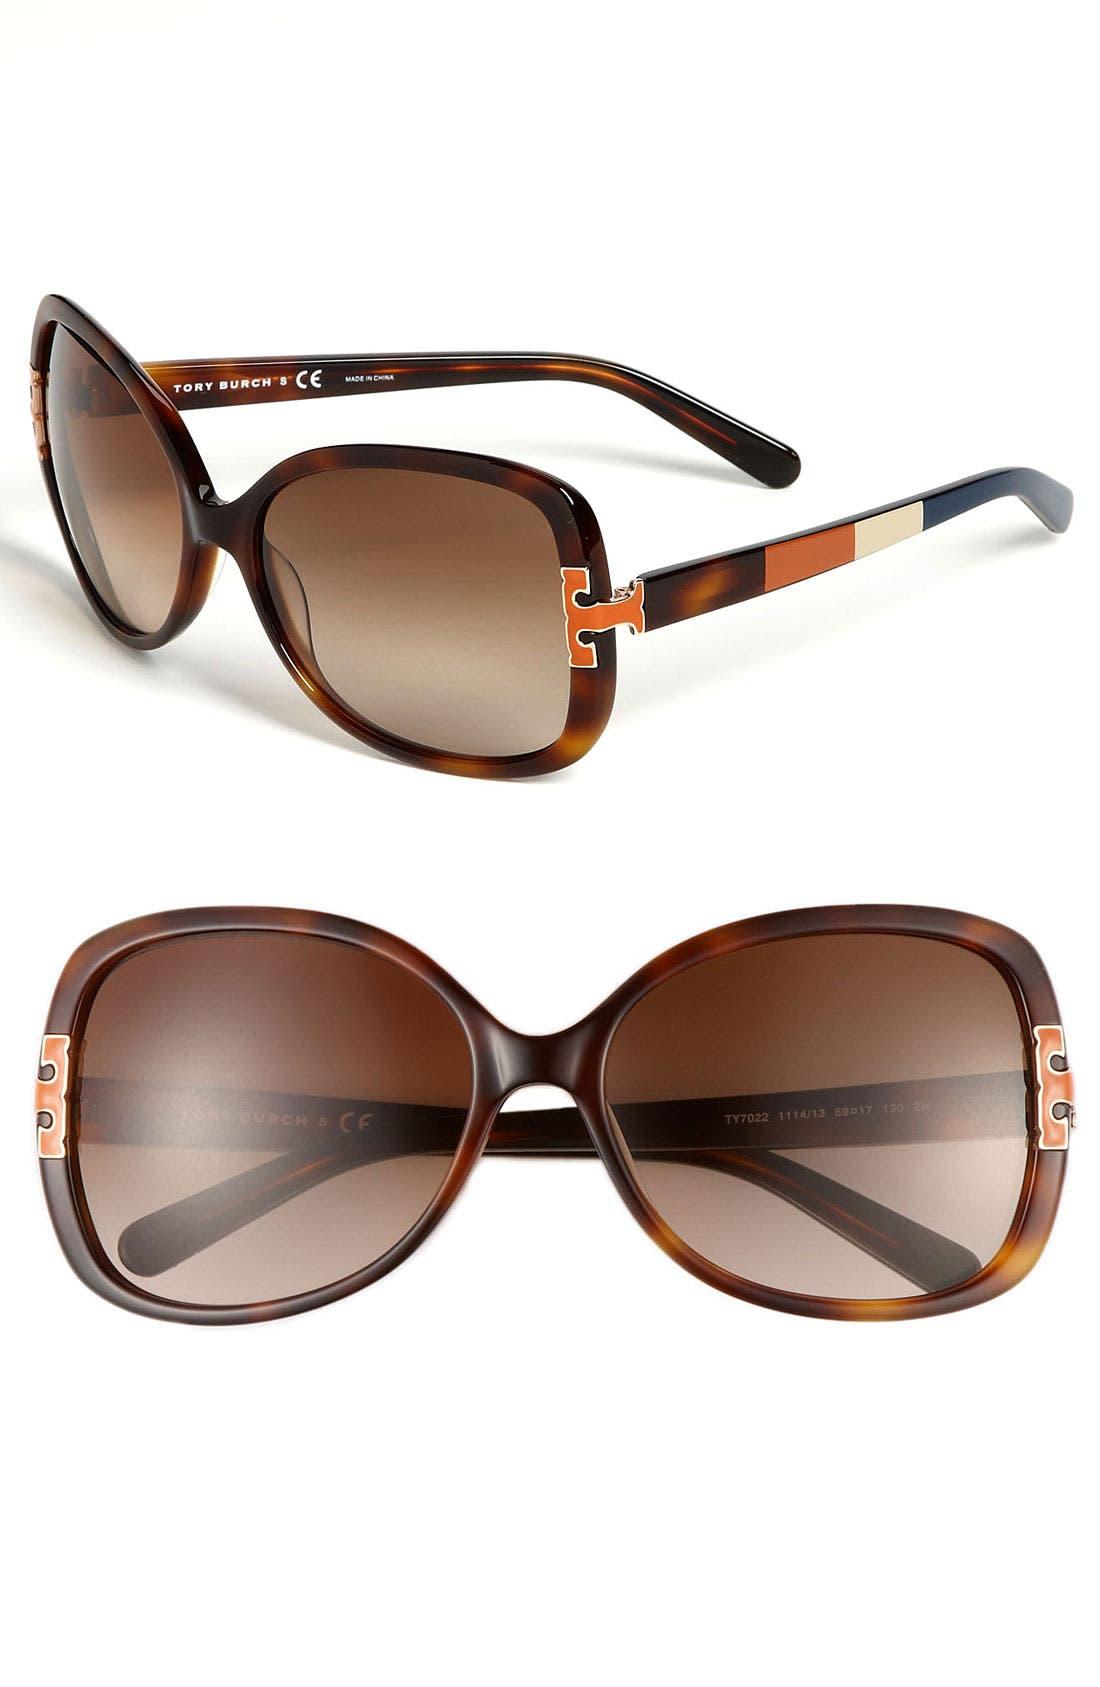 Main Image - Tory Burch 59mm Oversized Sunglasses